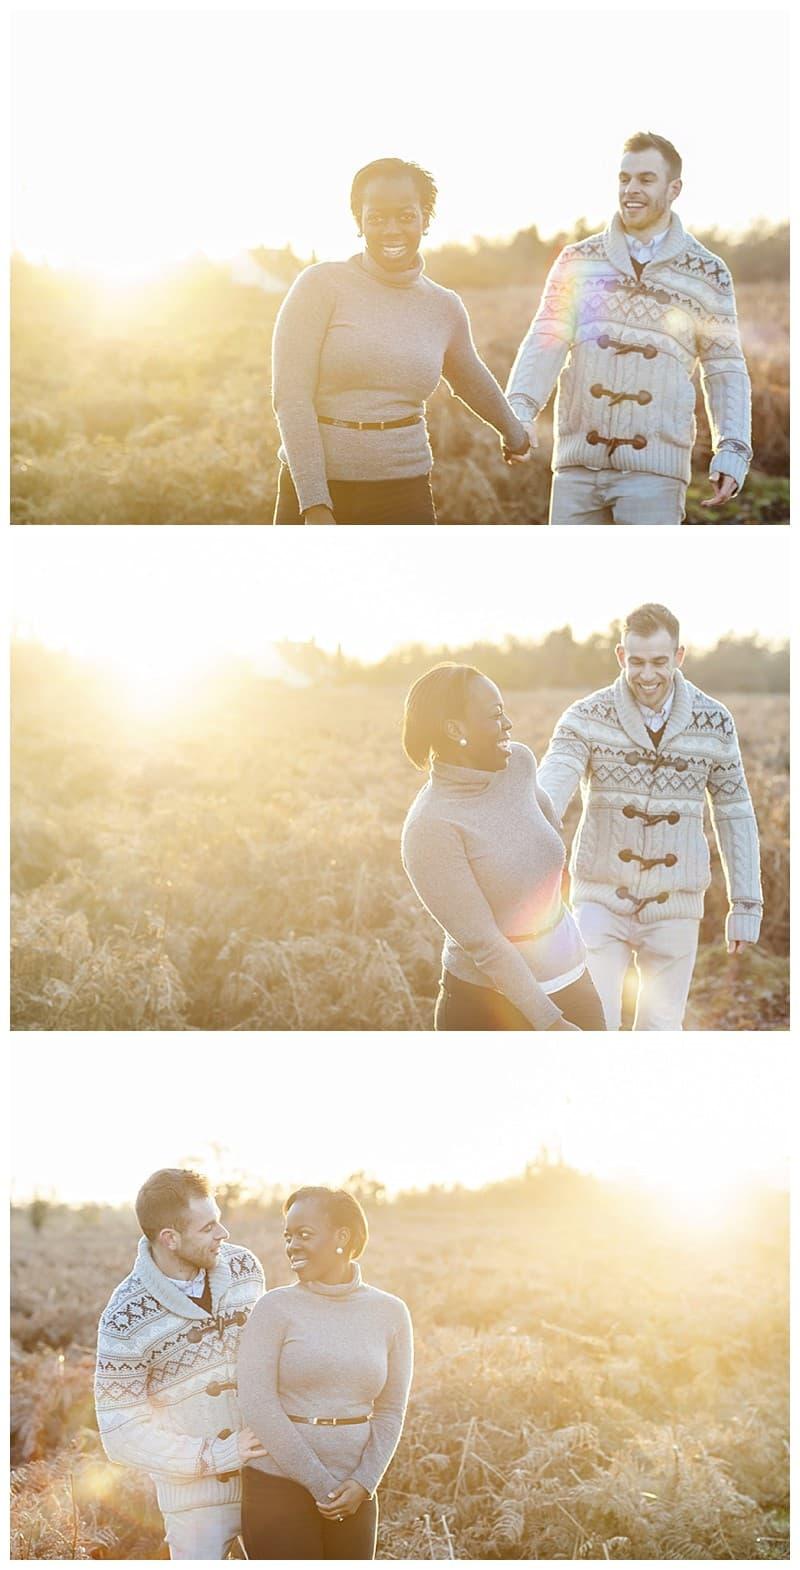 Sheyi & Simon Engagement Photoshoot, Bushy Park, London, Benjamin Wetherall Photography0013